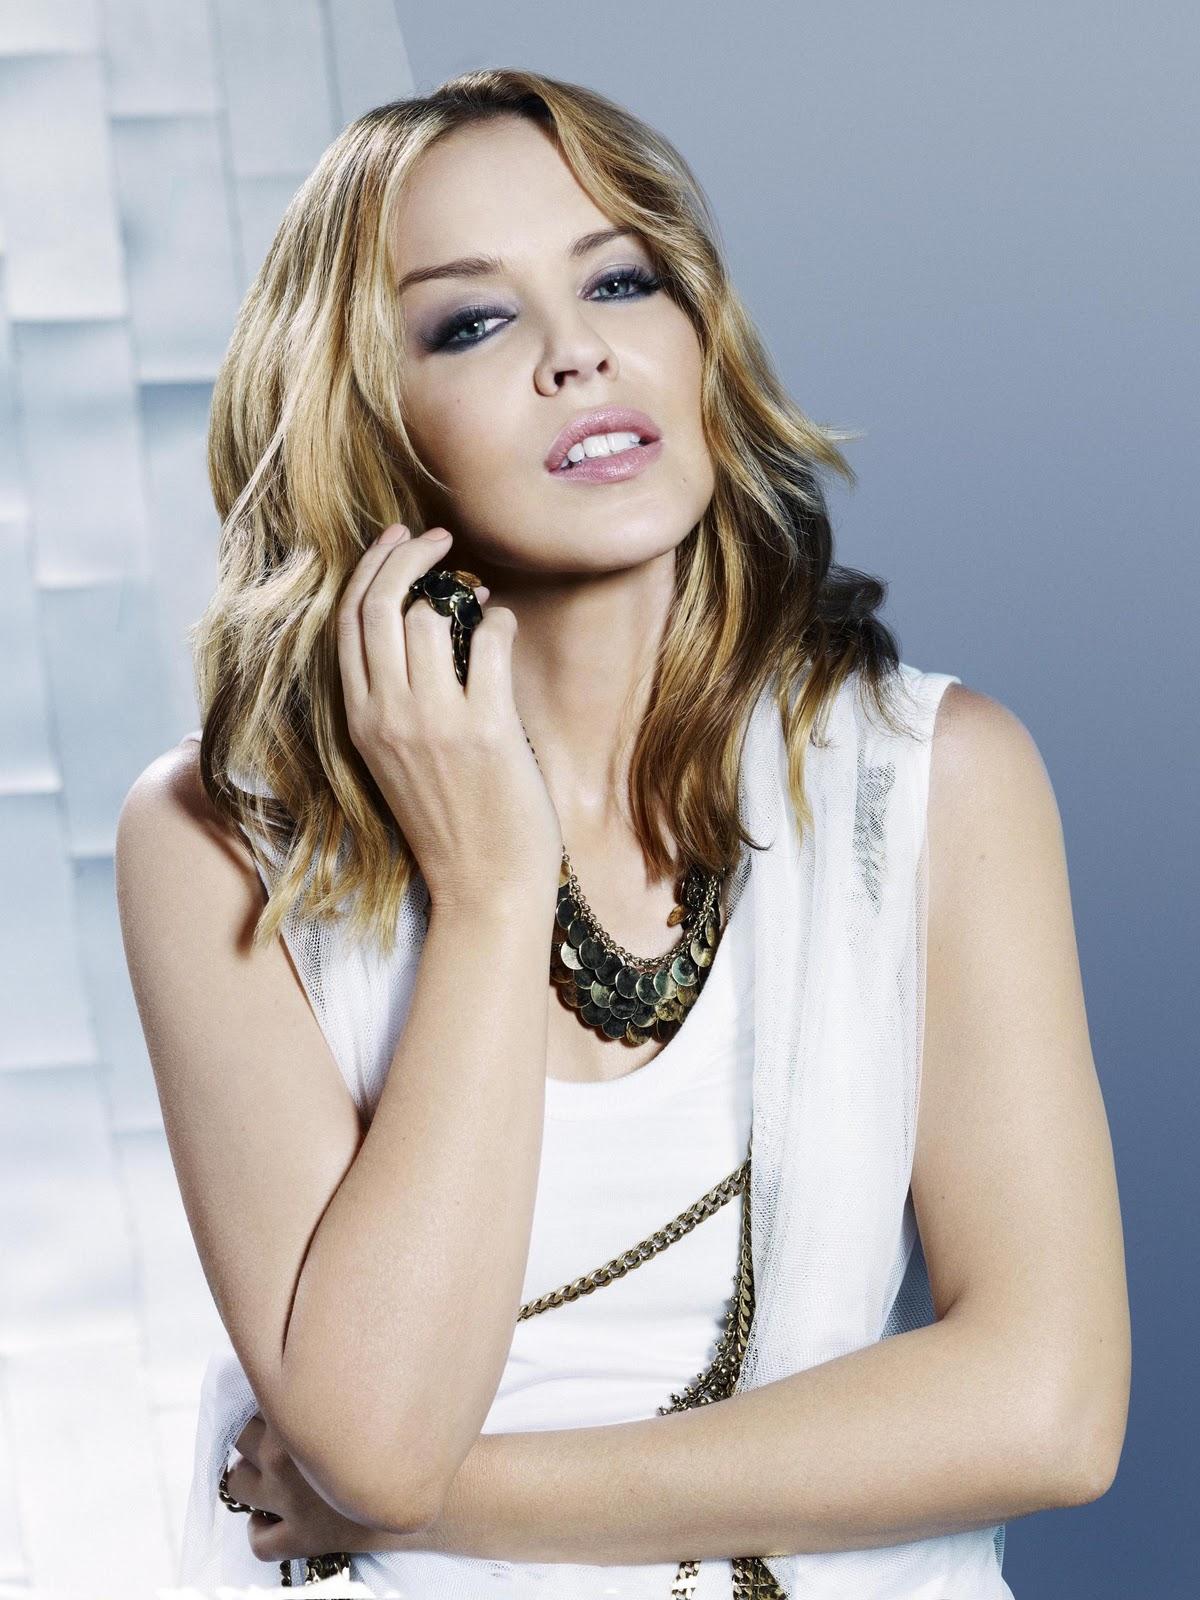 http://4.bp.blogspot.com/-exym7EF3948/TyCFA9mRkTI/AAAAAAAAB6g/NApDzVzDMyI/s1600/Kylie-Minogue-kylie-minogue-17291654-1920-2560.jpg